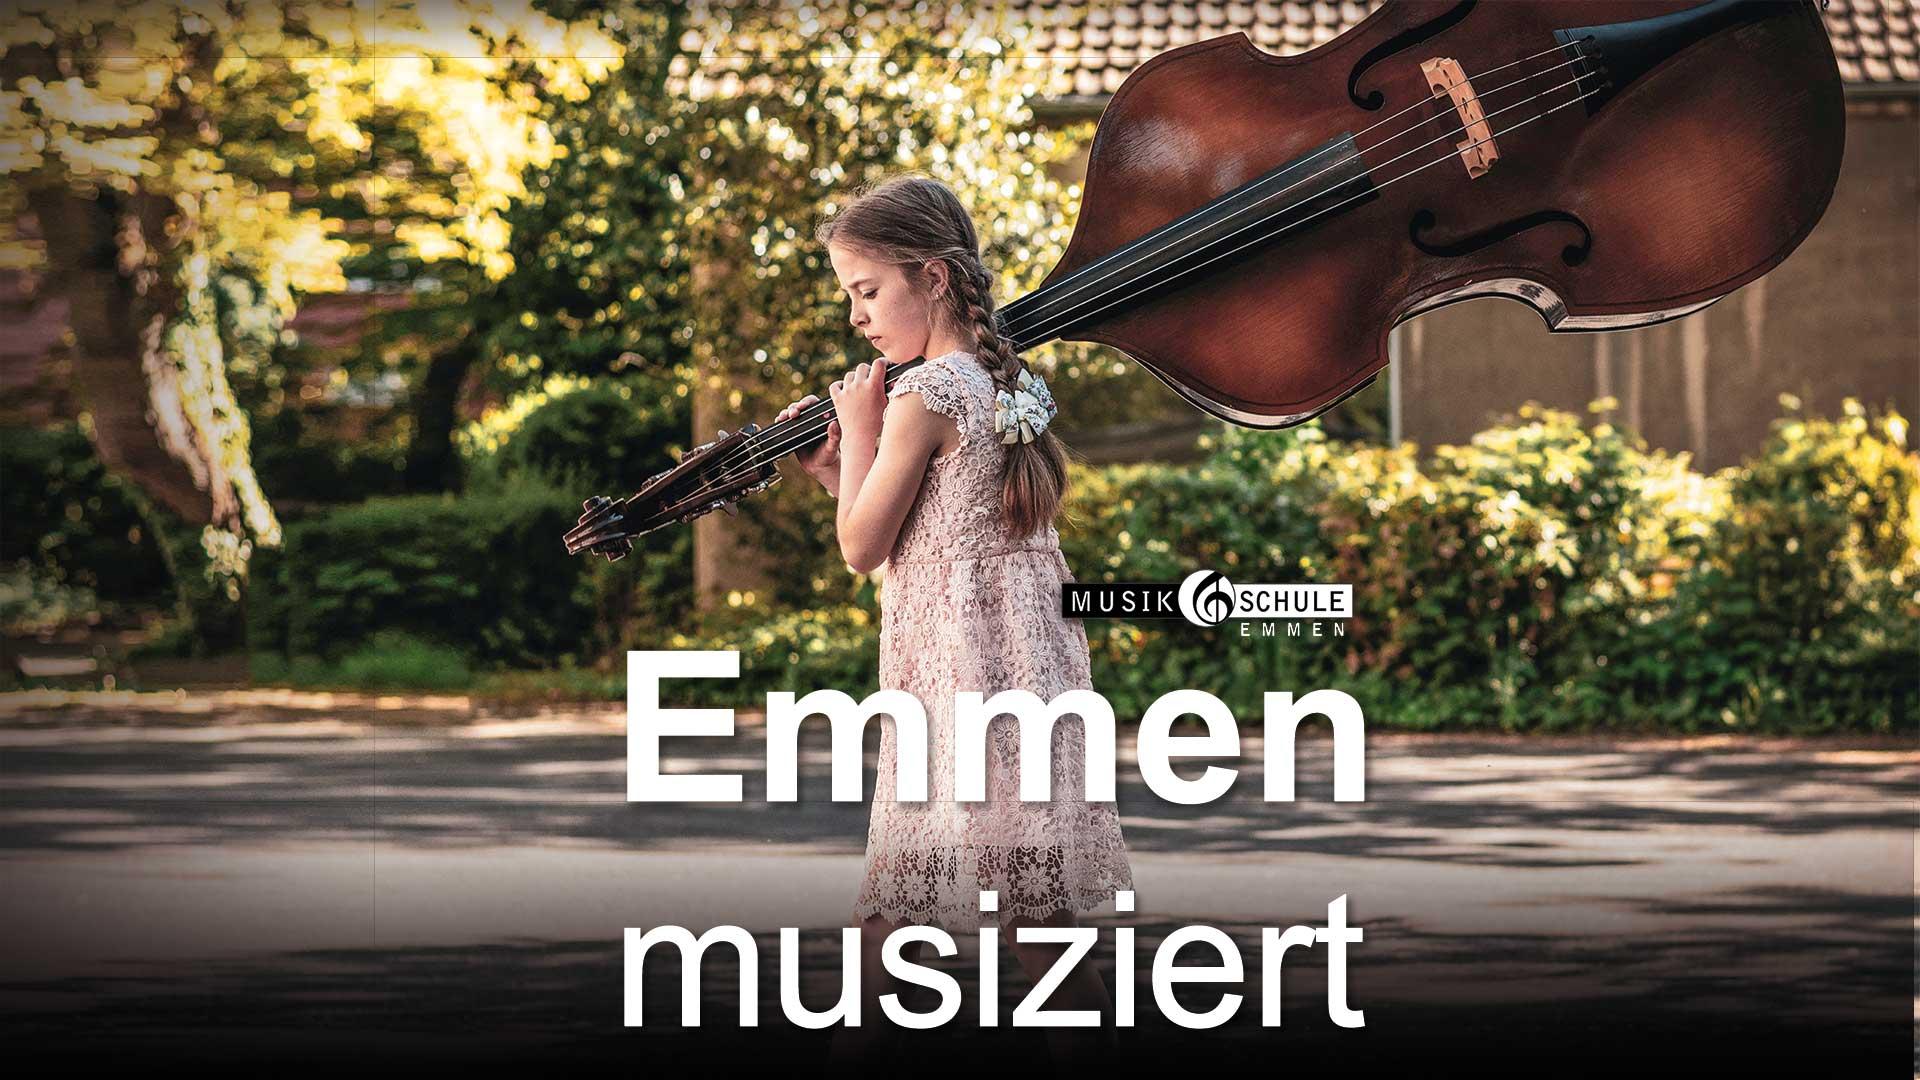 Musikschule Emmen